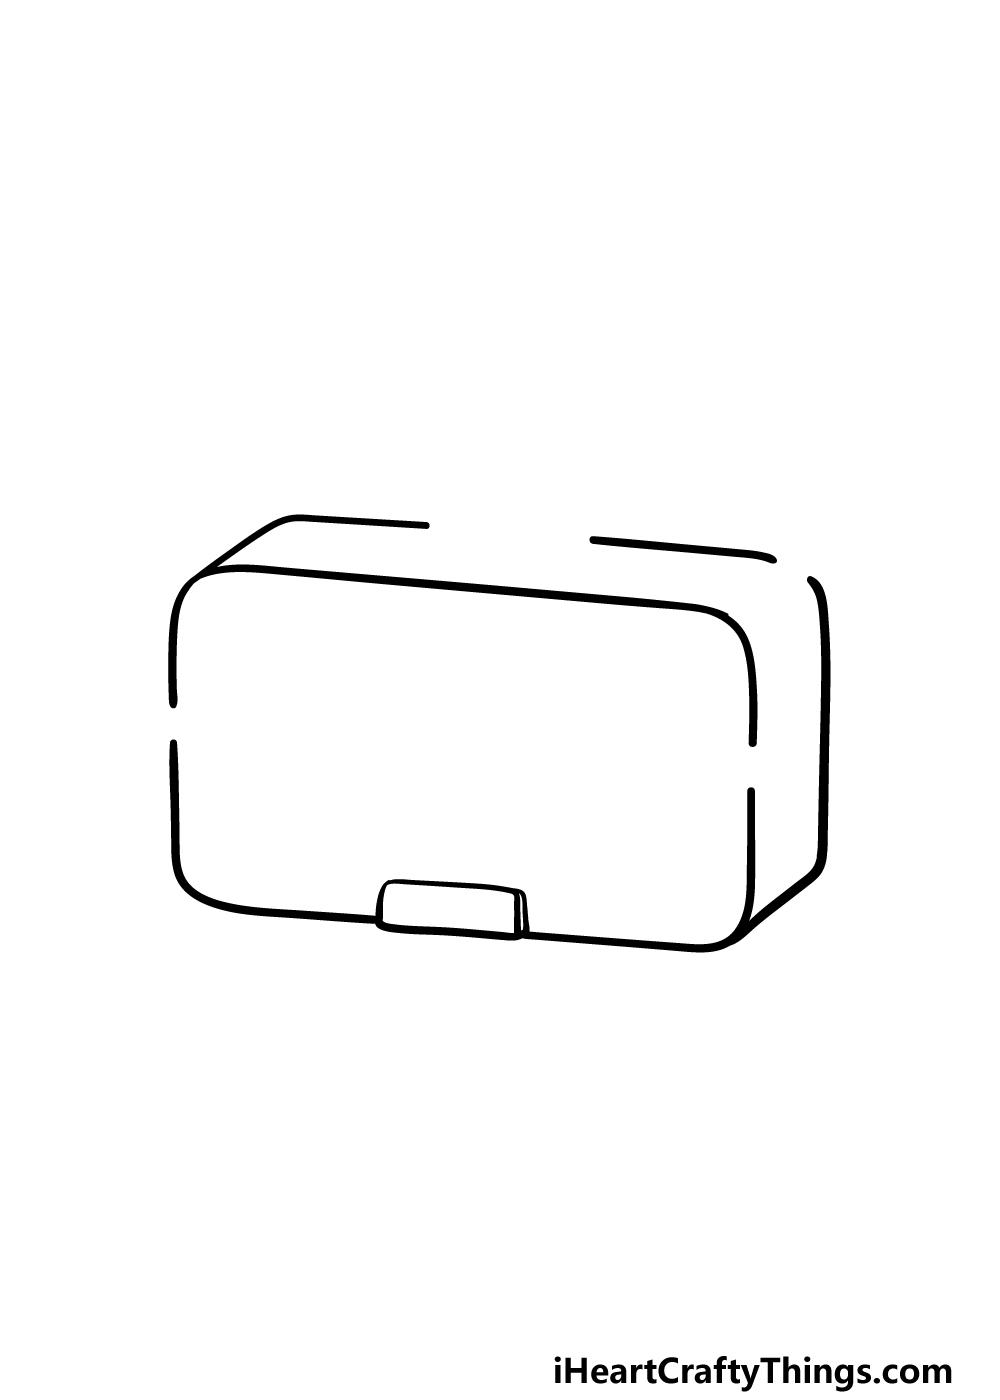 drawing a radio step 1